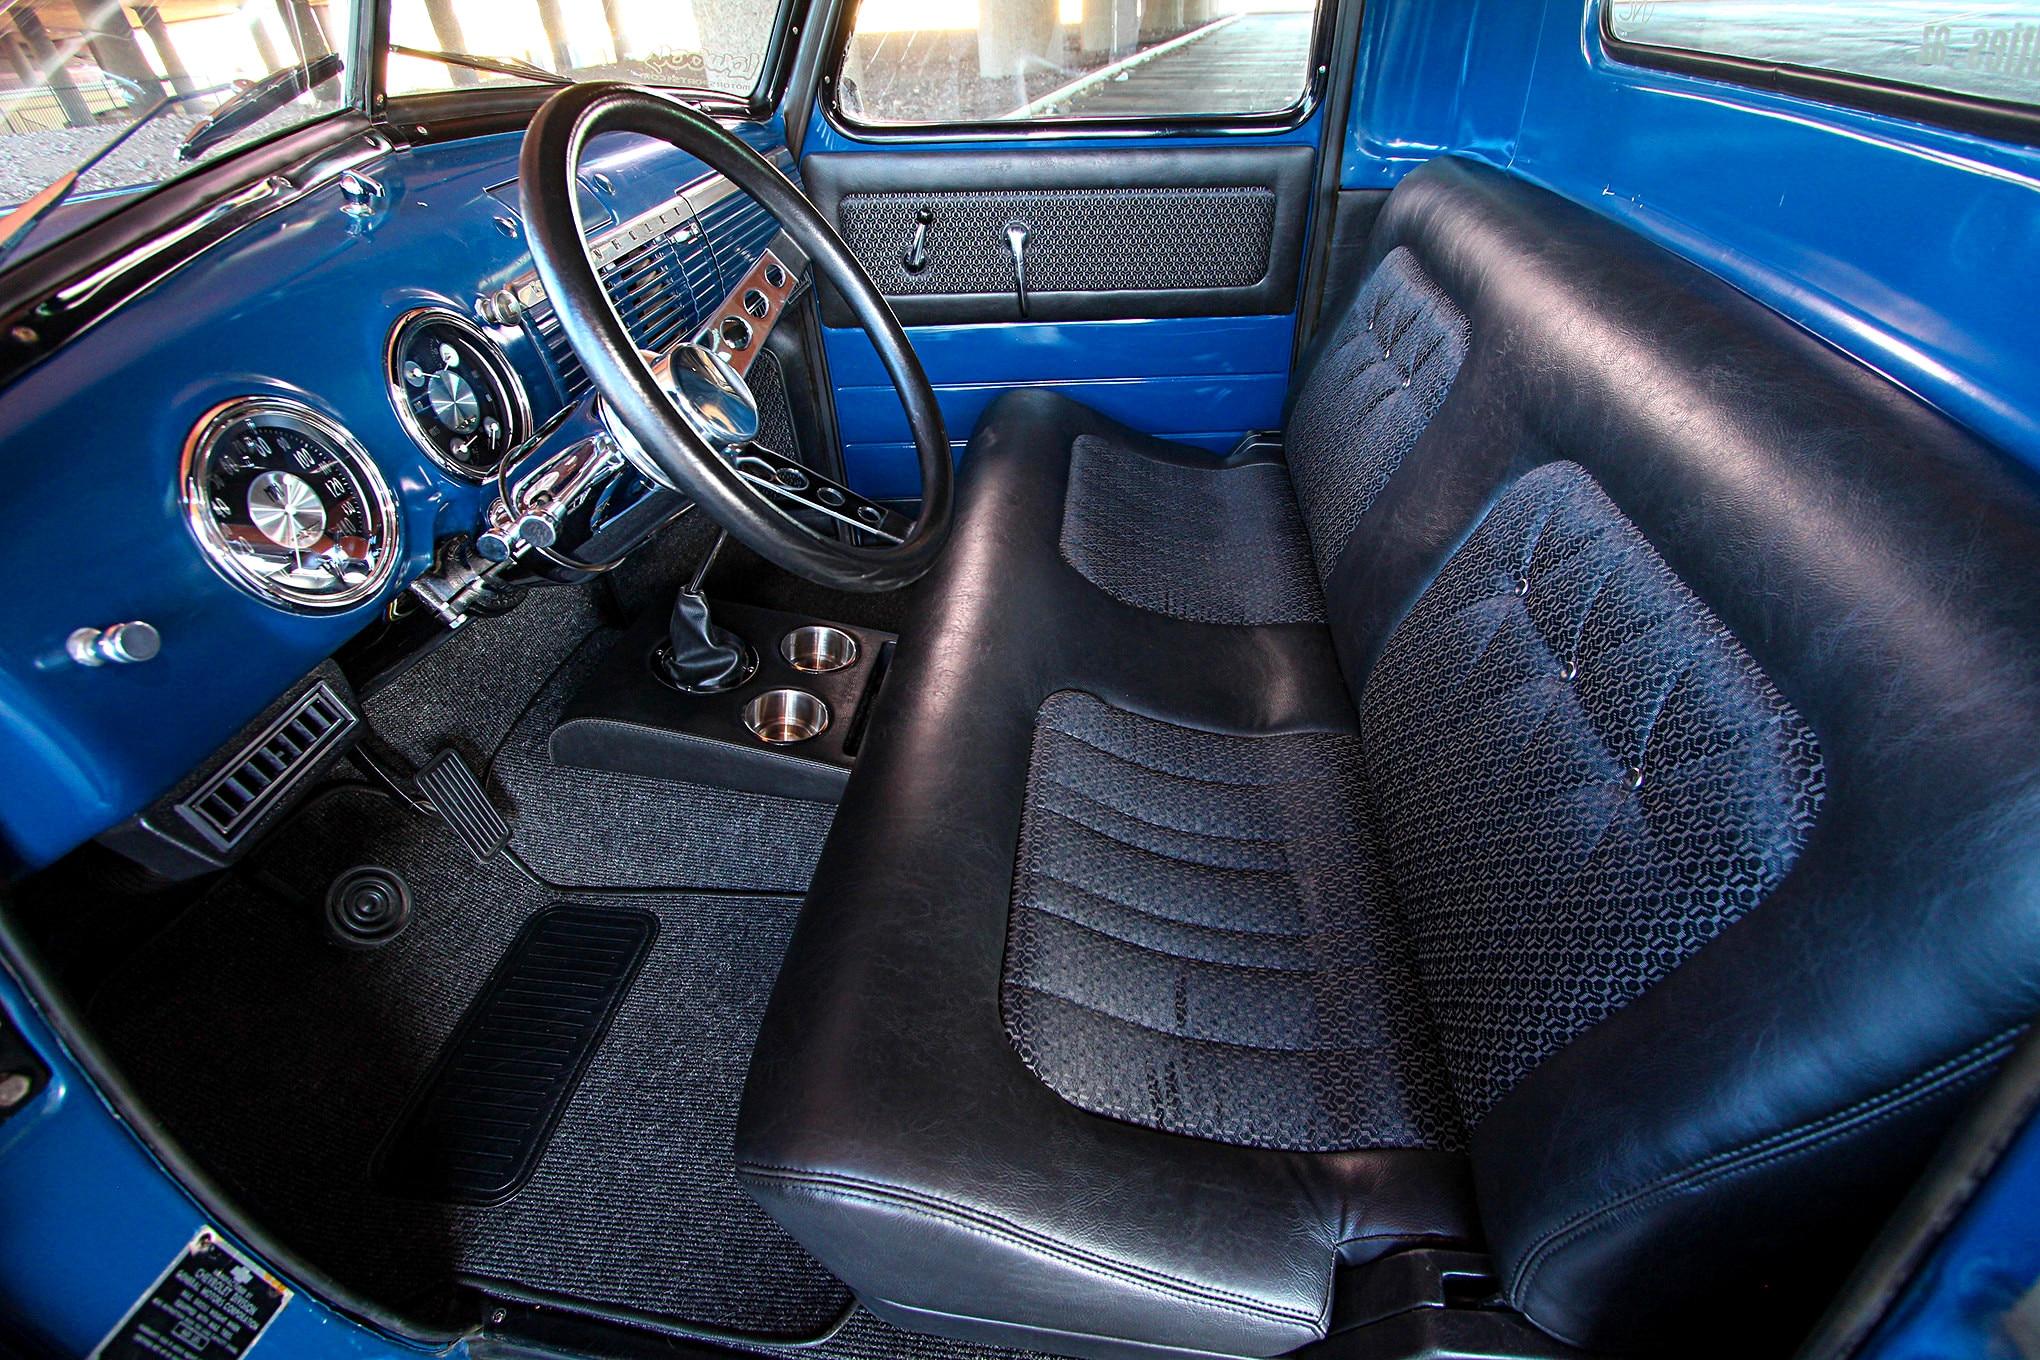 Chad Fincher S Slammed 1950 Chevy 3100 Truck